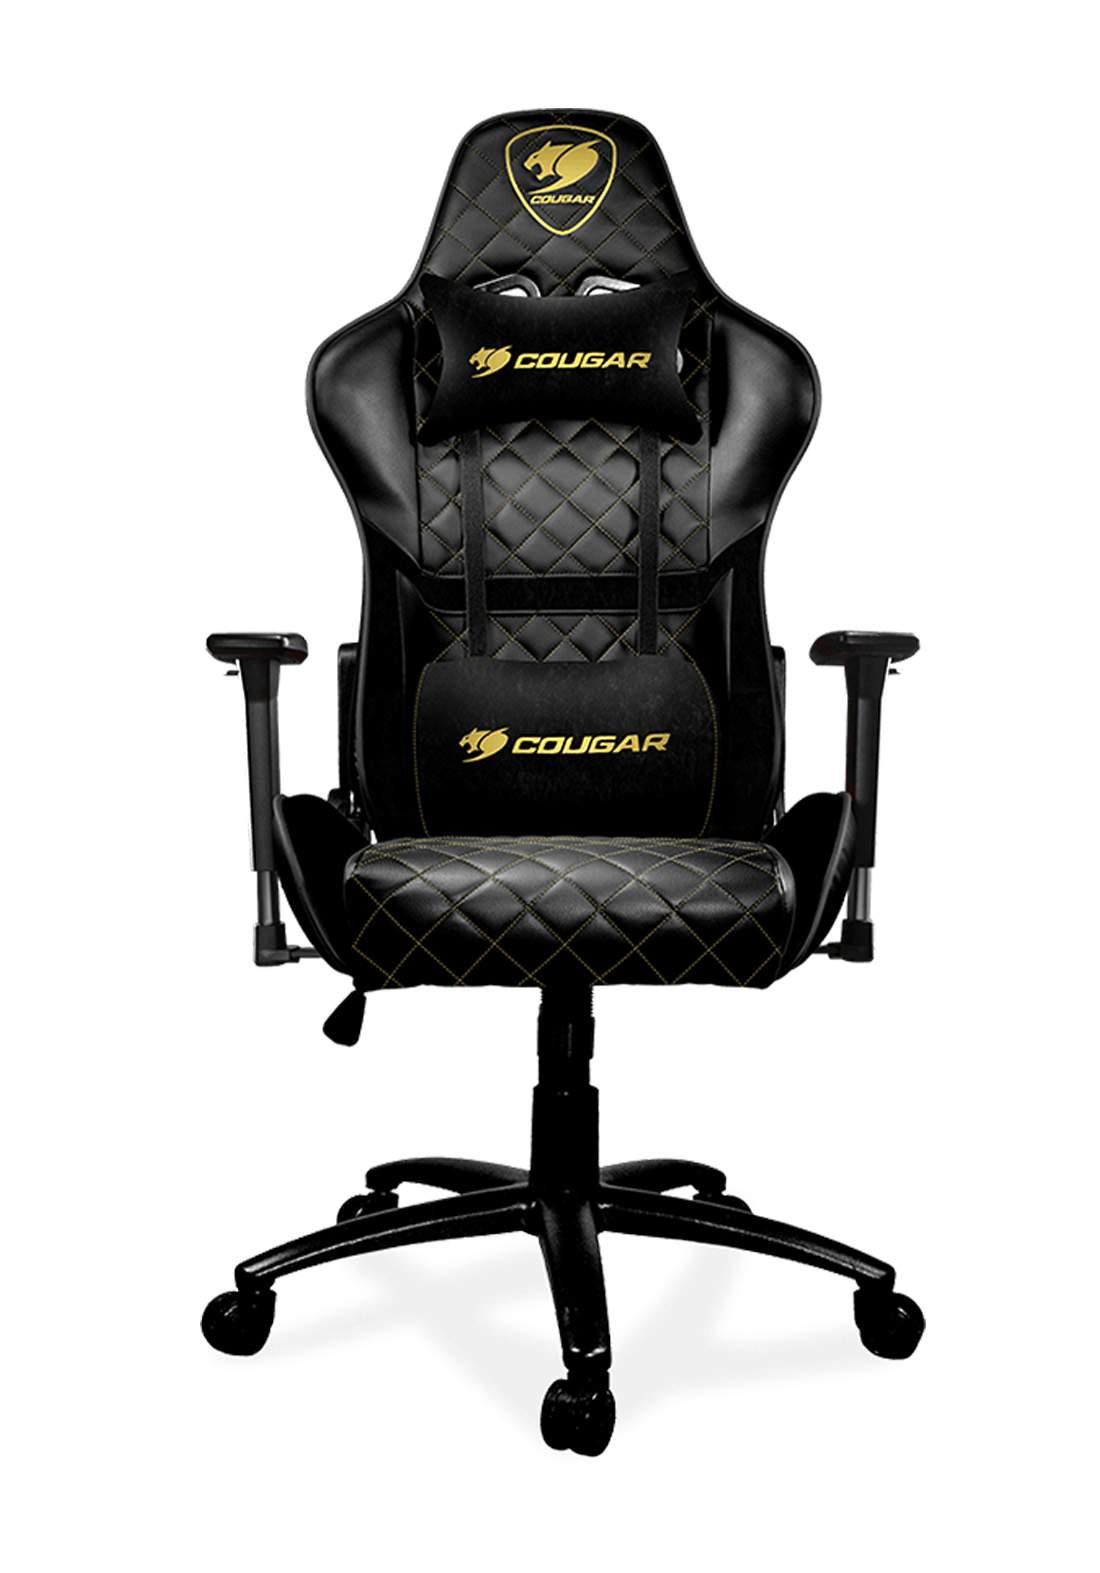 Cougar Armor One Royal Gaming Chair - Black كرسي ألعاب